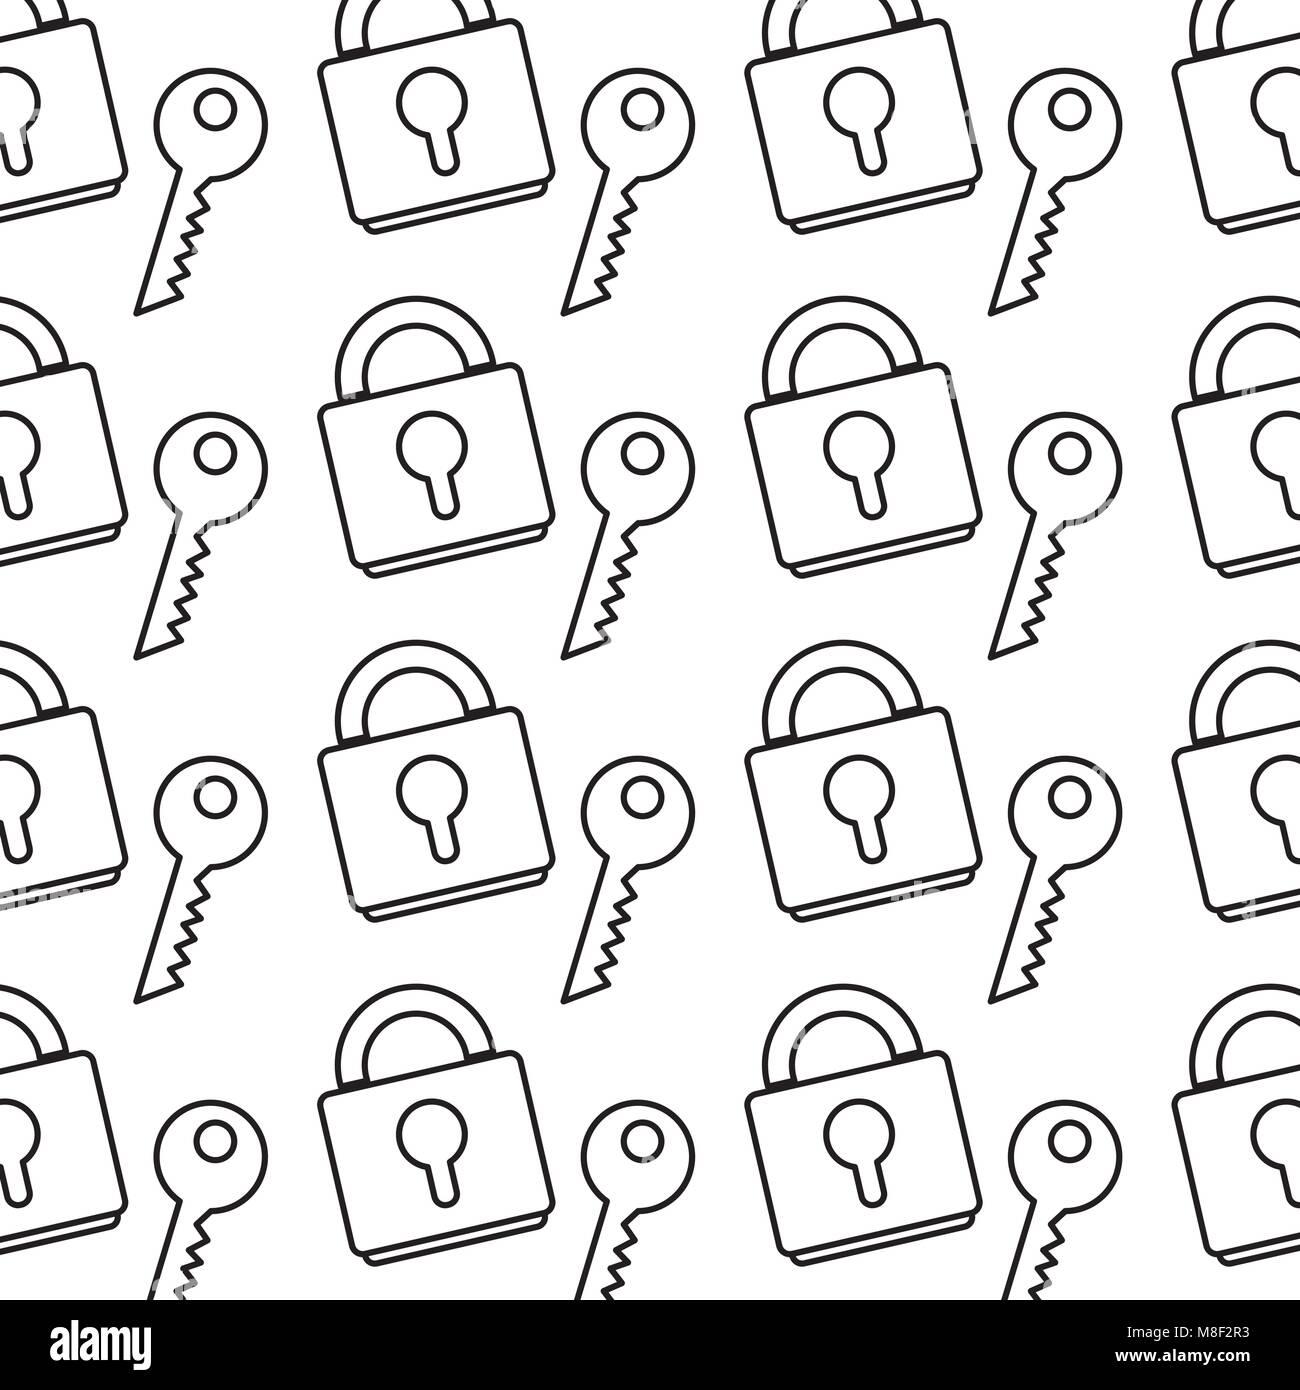 line close padlock object with key background - Stock Image